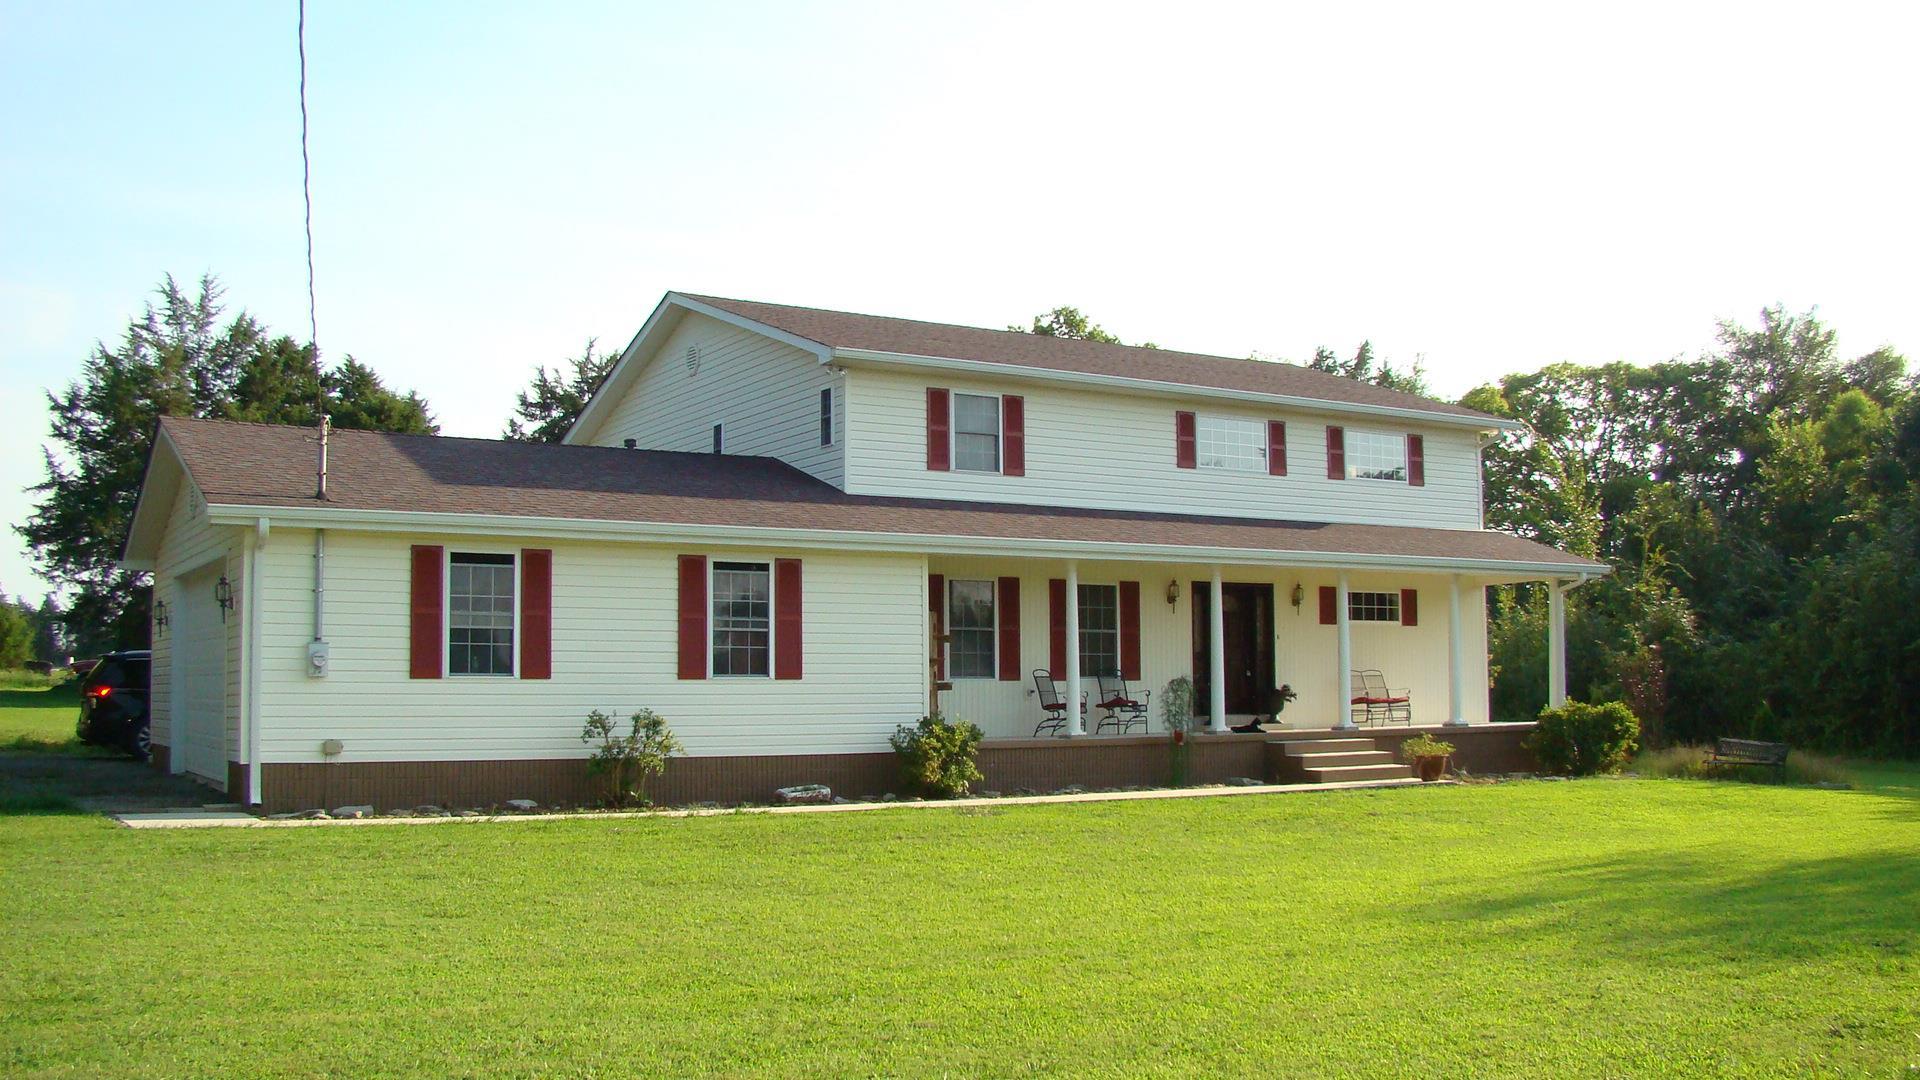 173 Harts Chapel Rd, Shelbyville, TN 37160 - Shelbyville, TN real estate listing